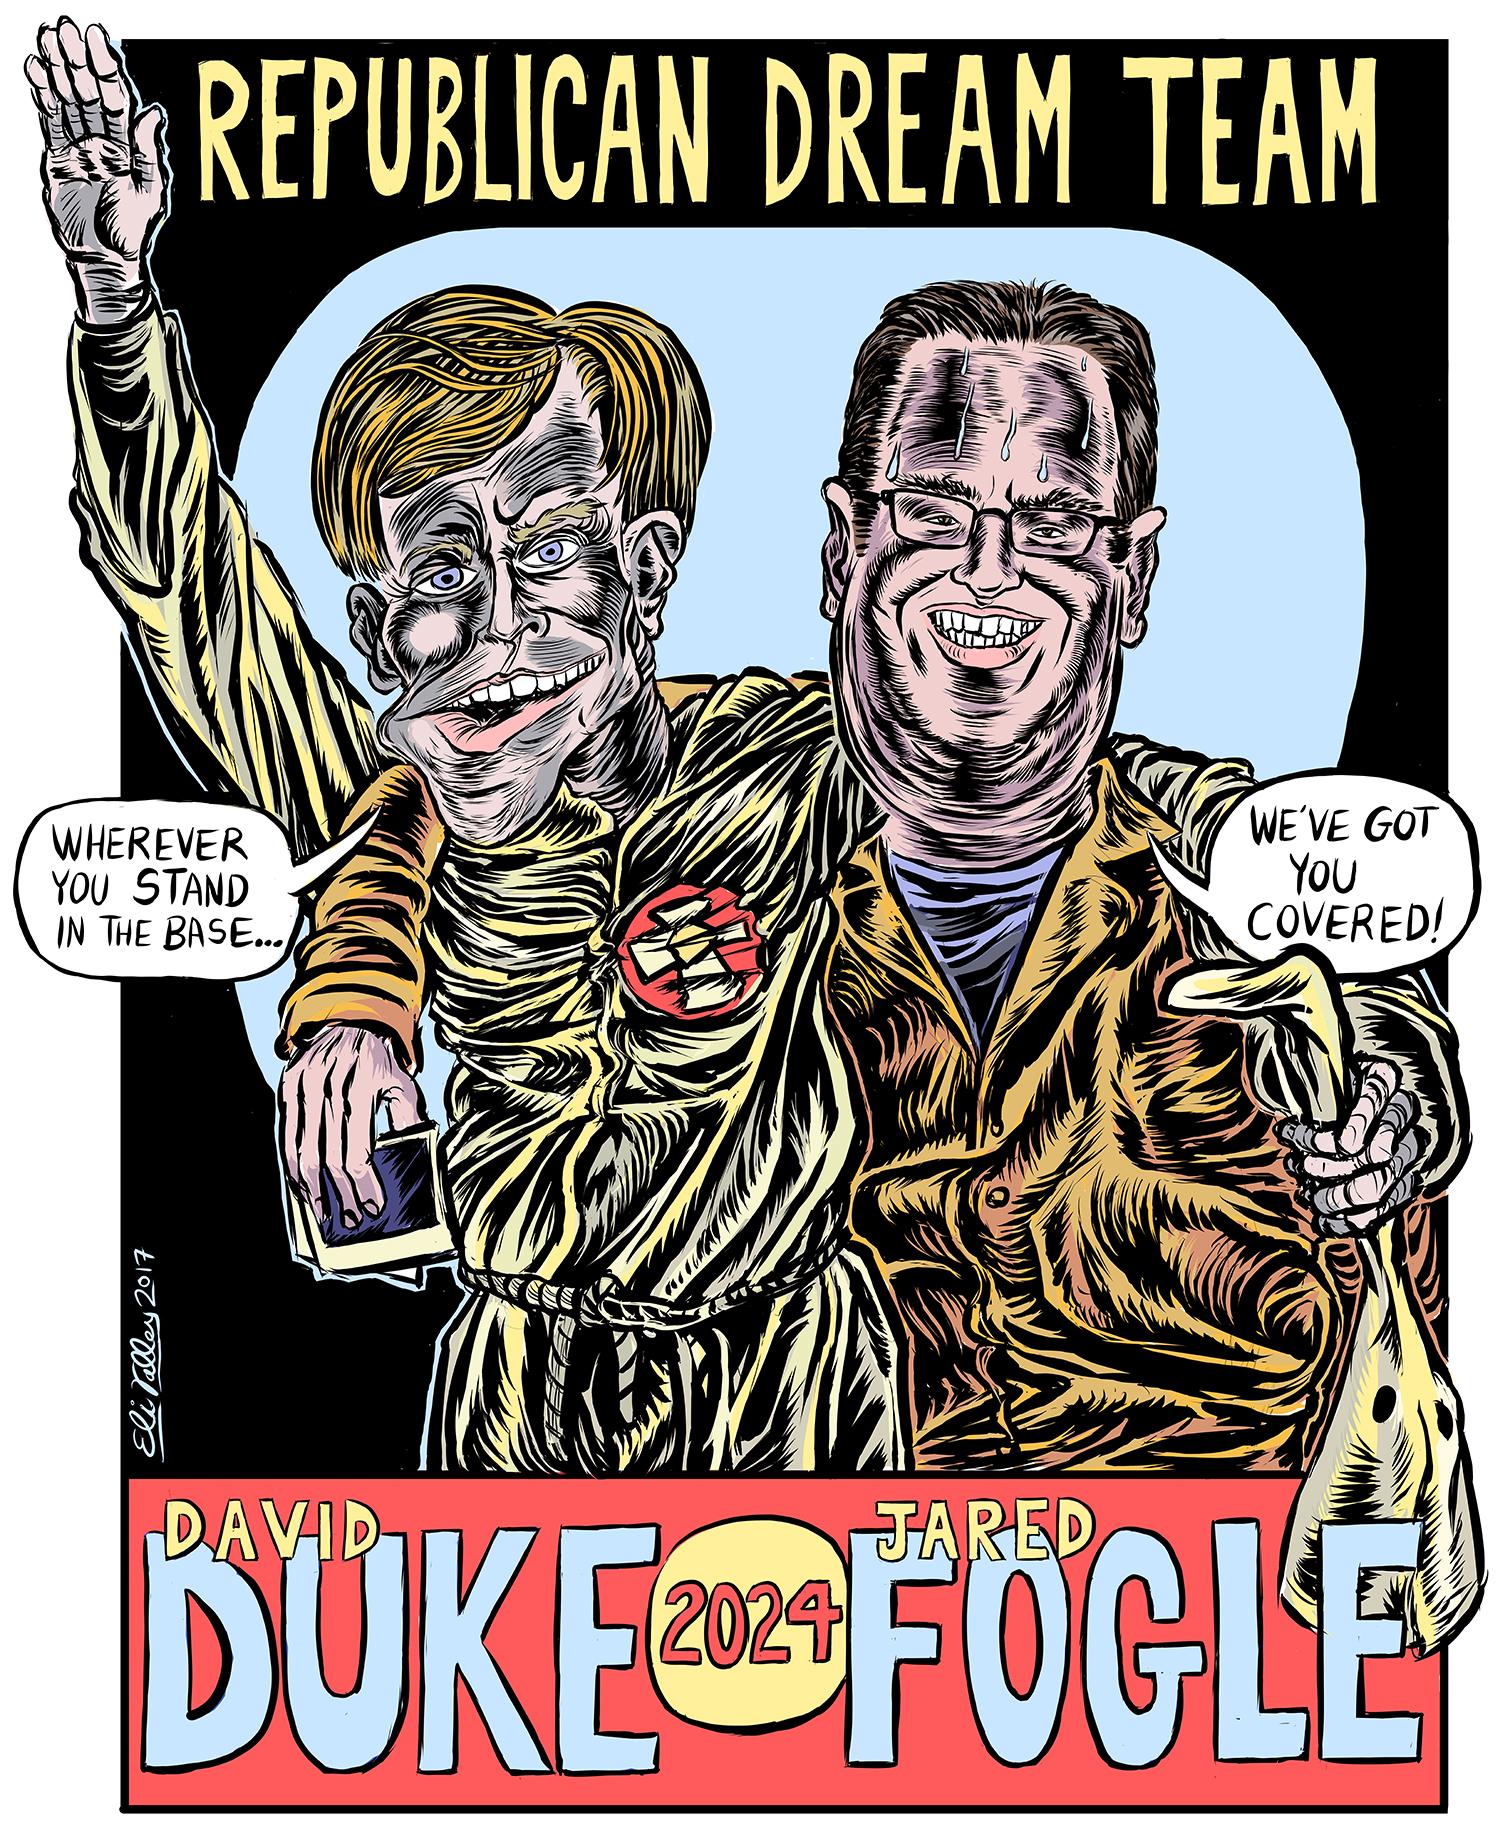 Eli Valley.Republican Dream Team 2024.David Duke.Jared Fogle.jpg